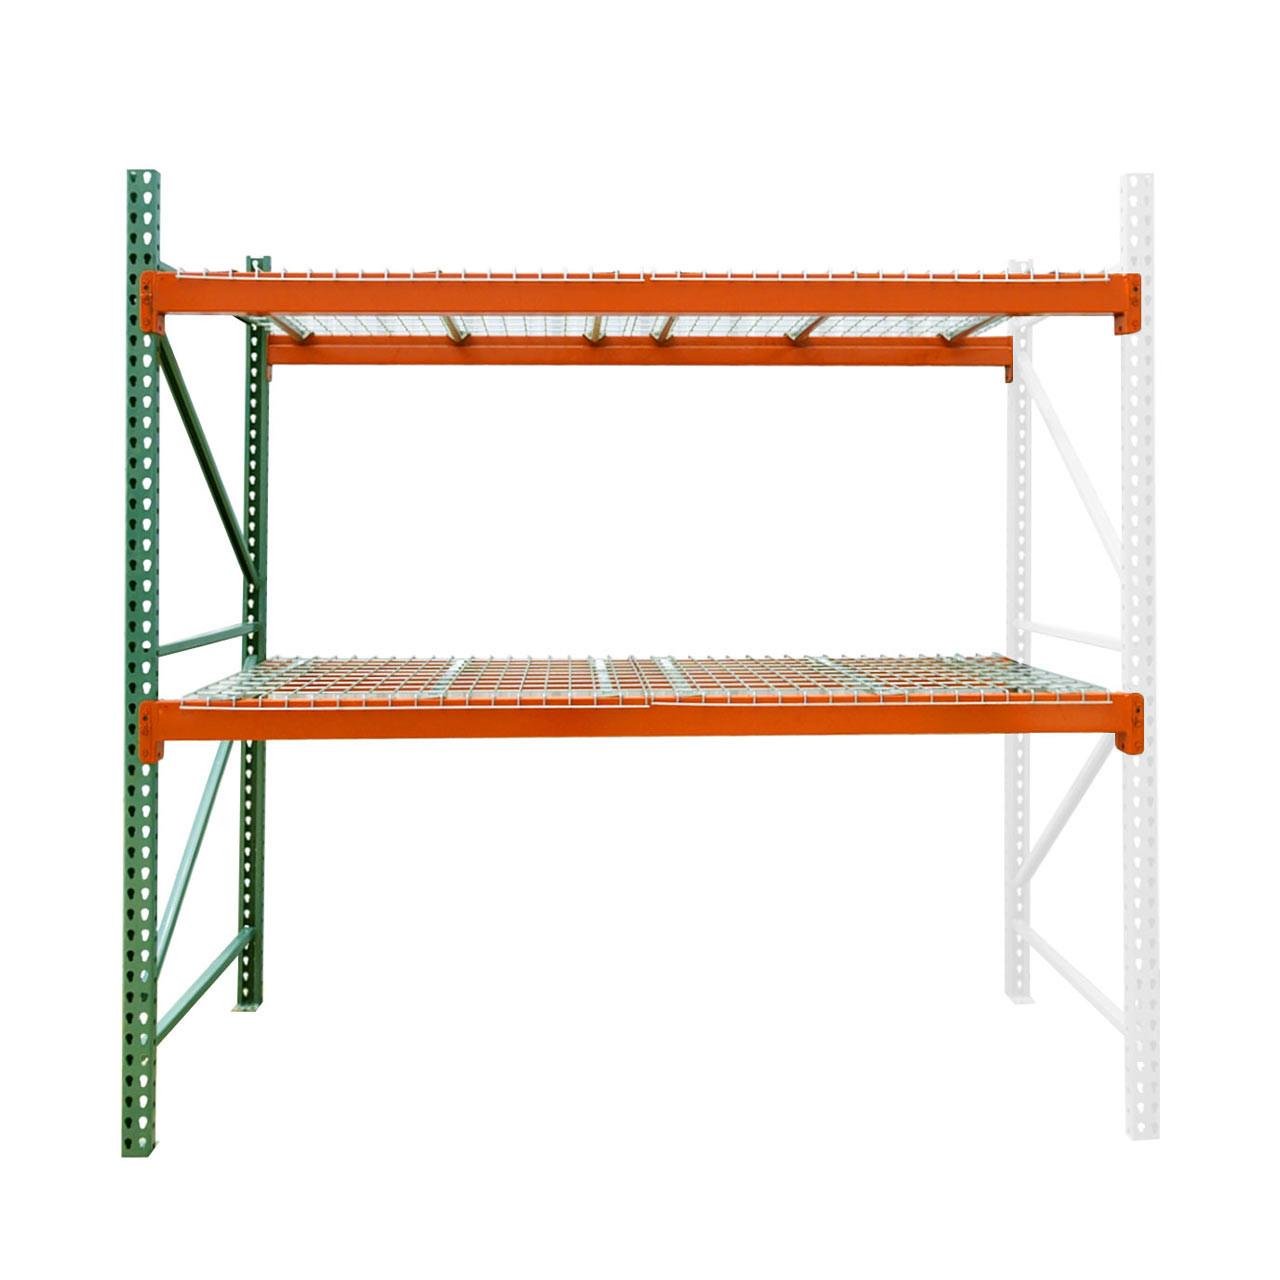 "36"" deep teardrop pallet rack adder kit with wire deck"